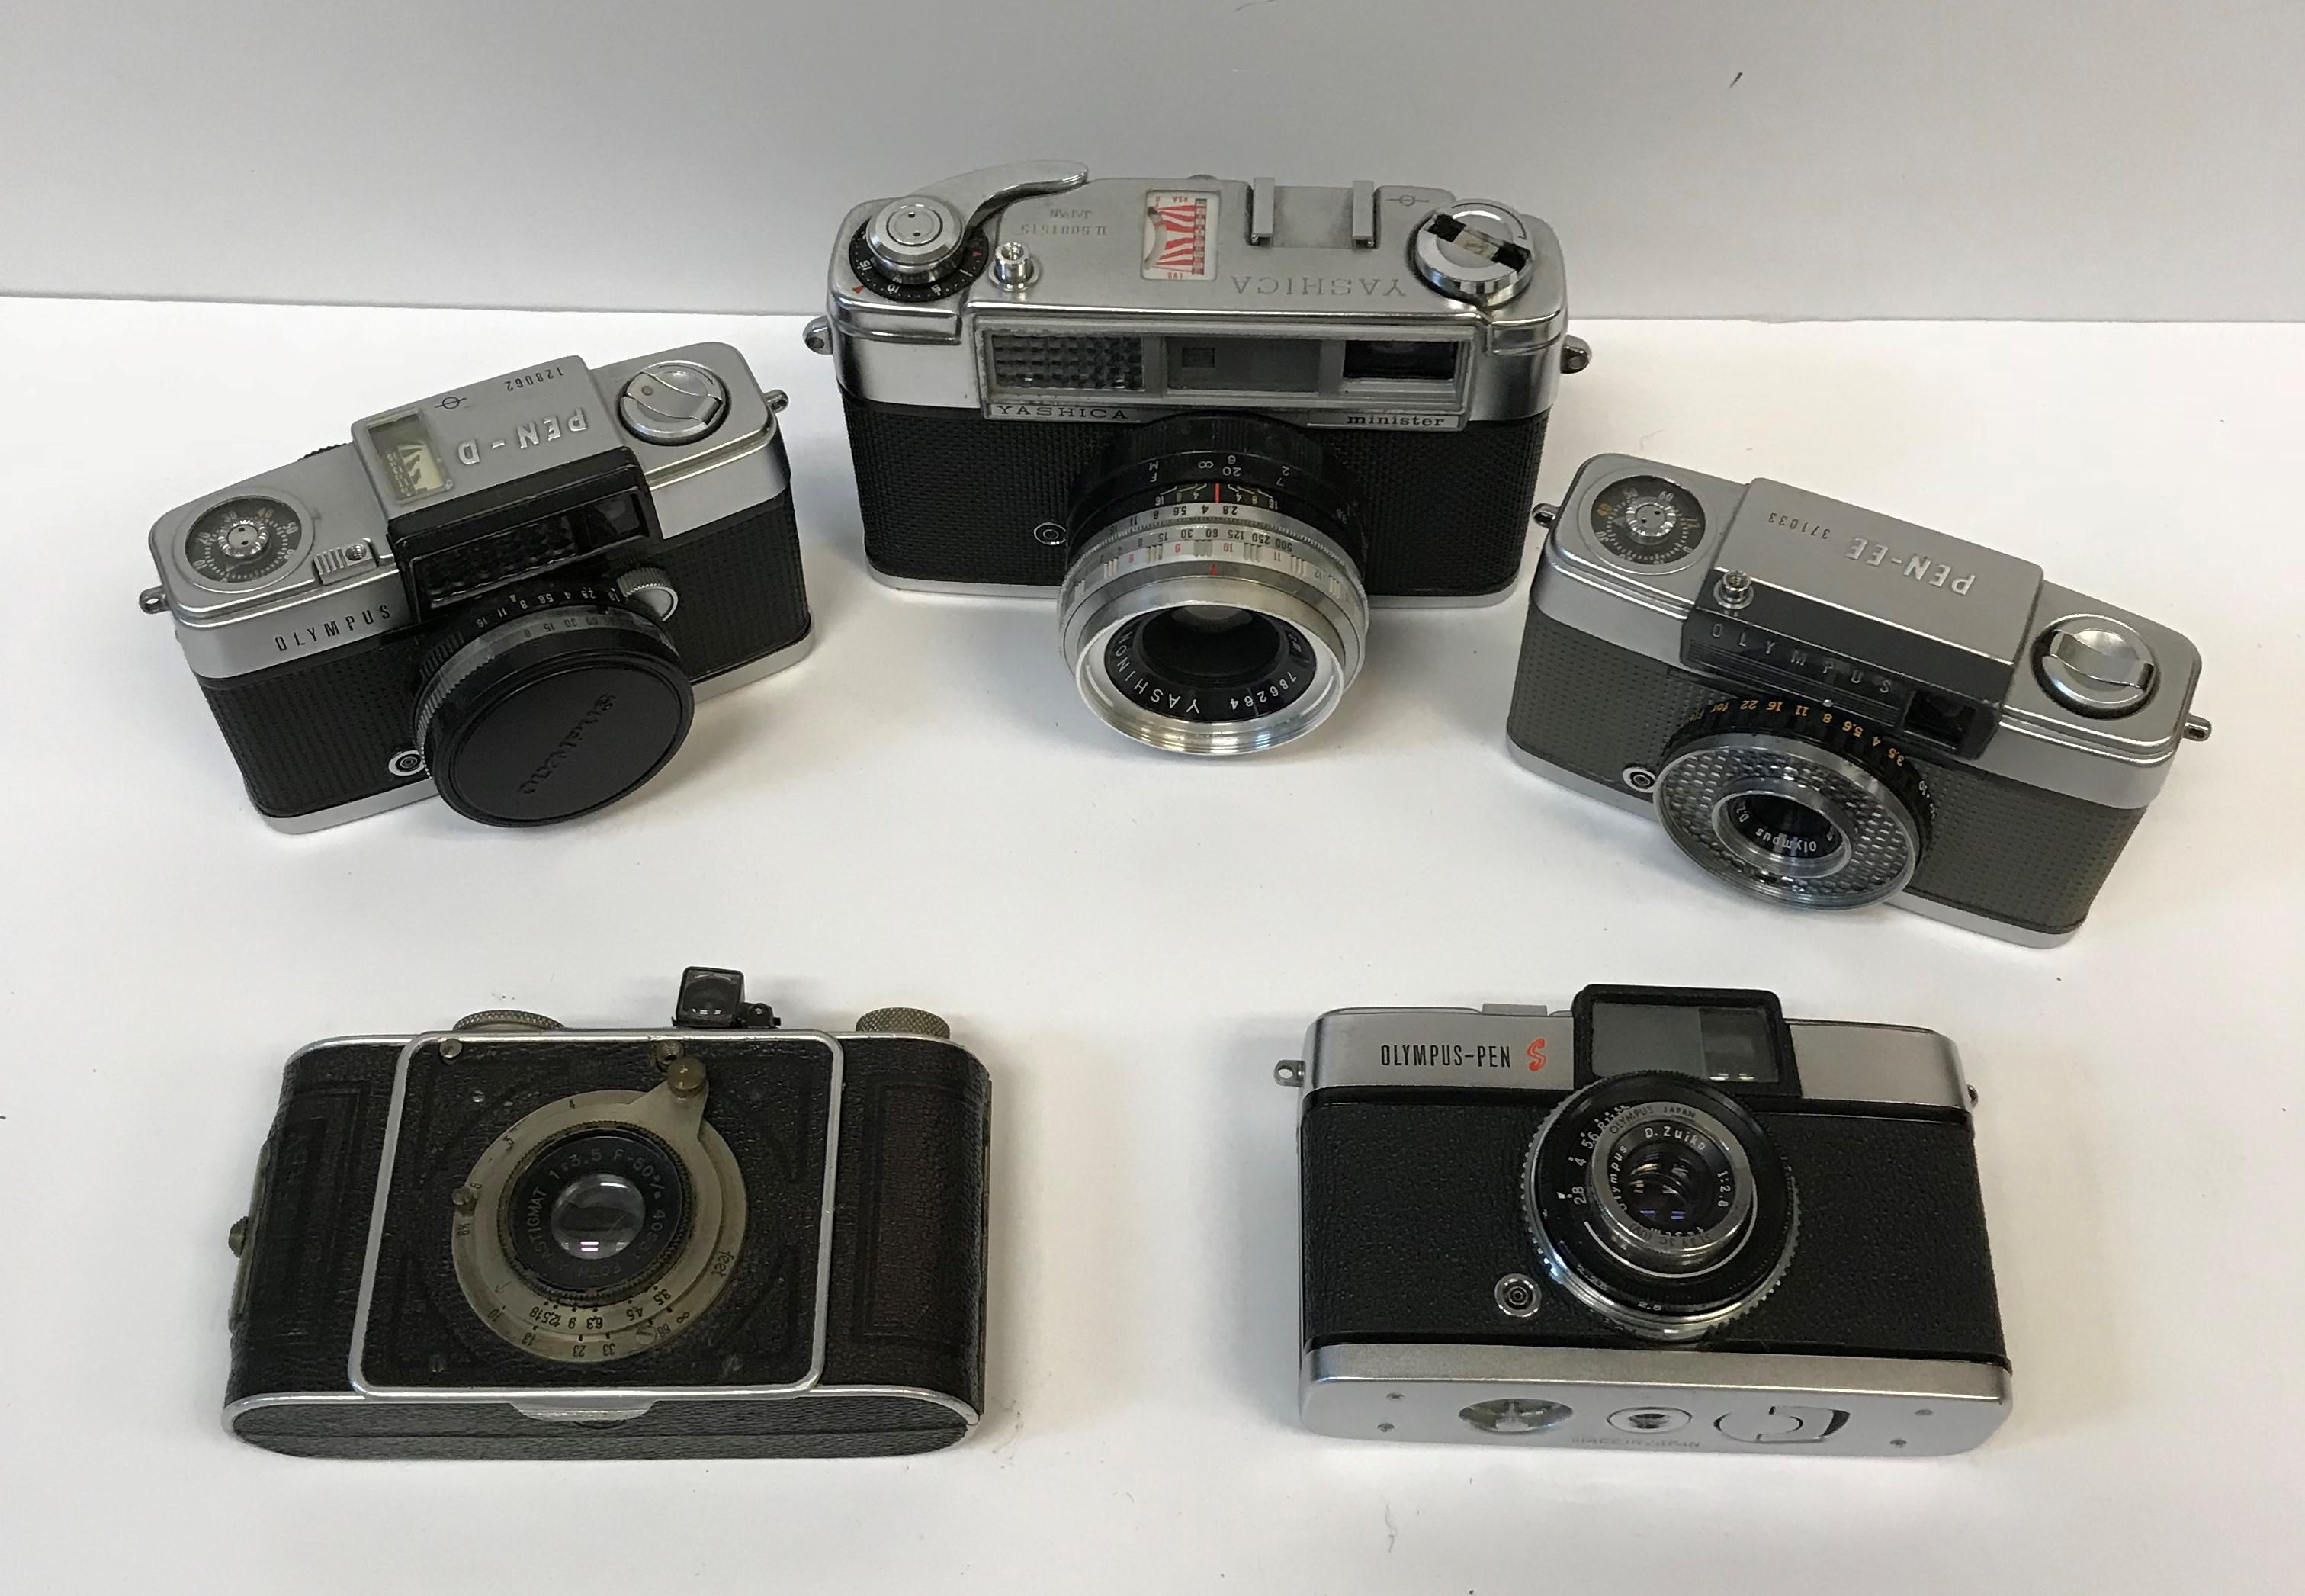 A collection of six various cameras including an Edixa 16-S mini camera, an Olympus Pen-D camera,